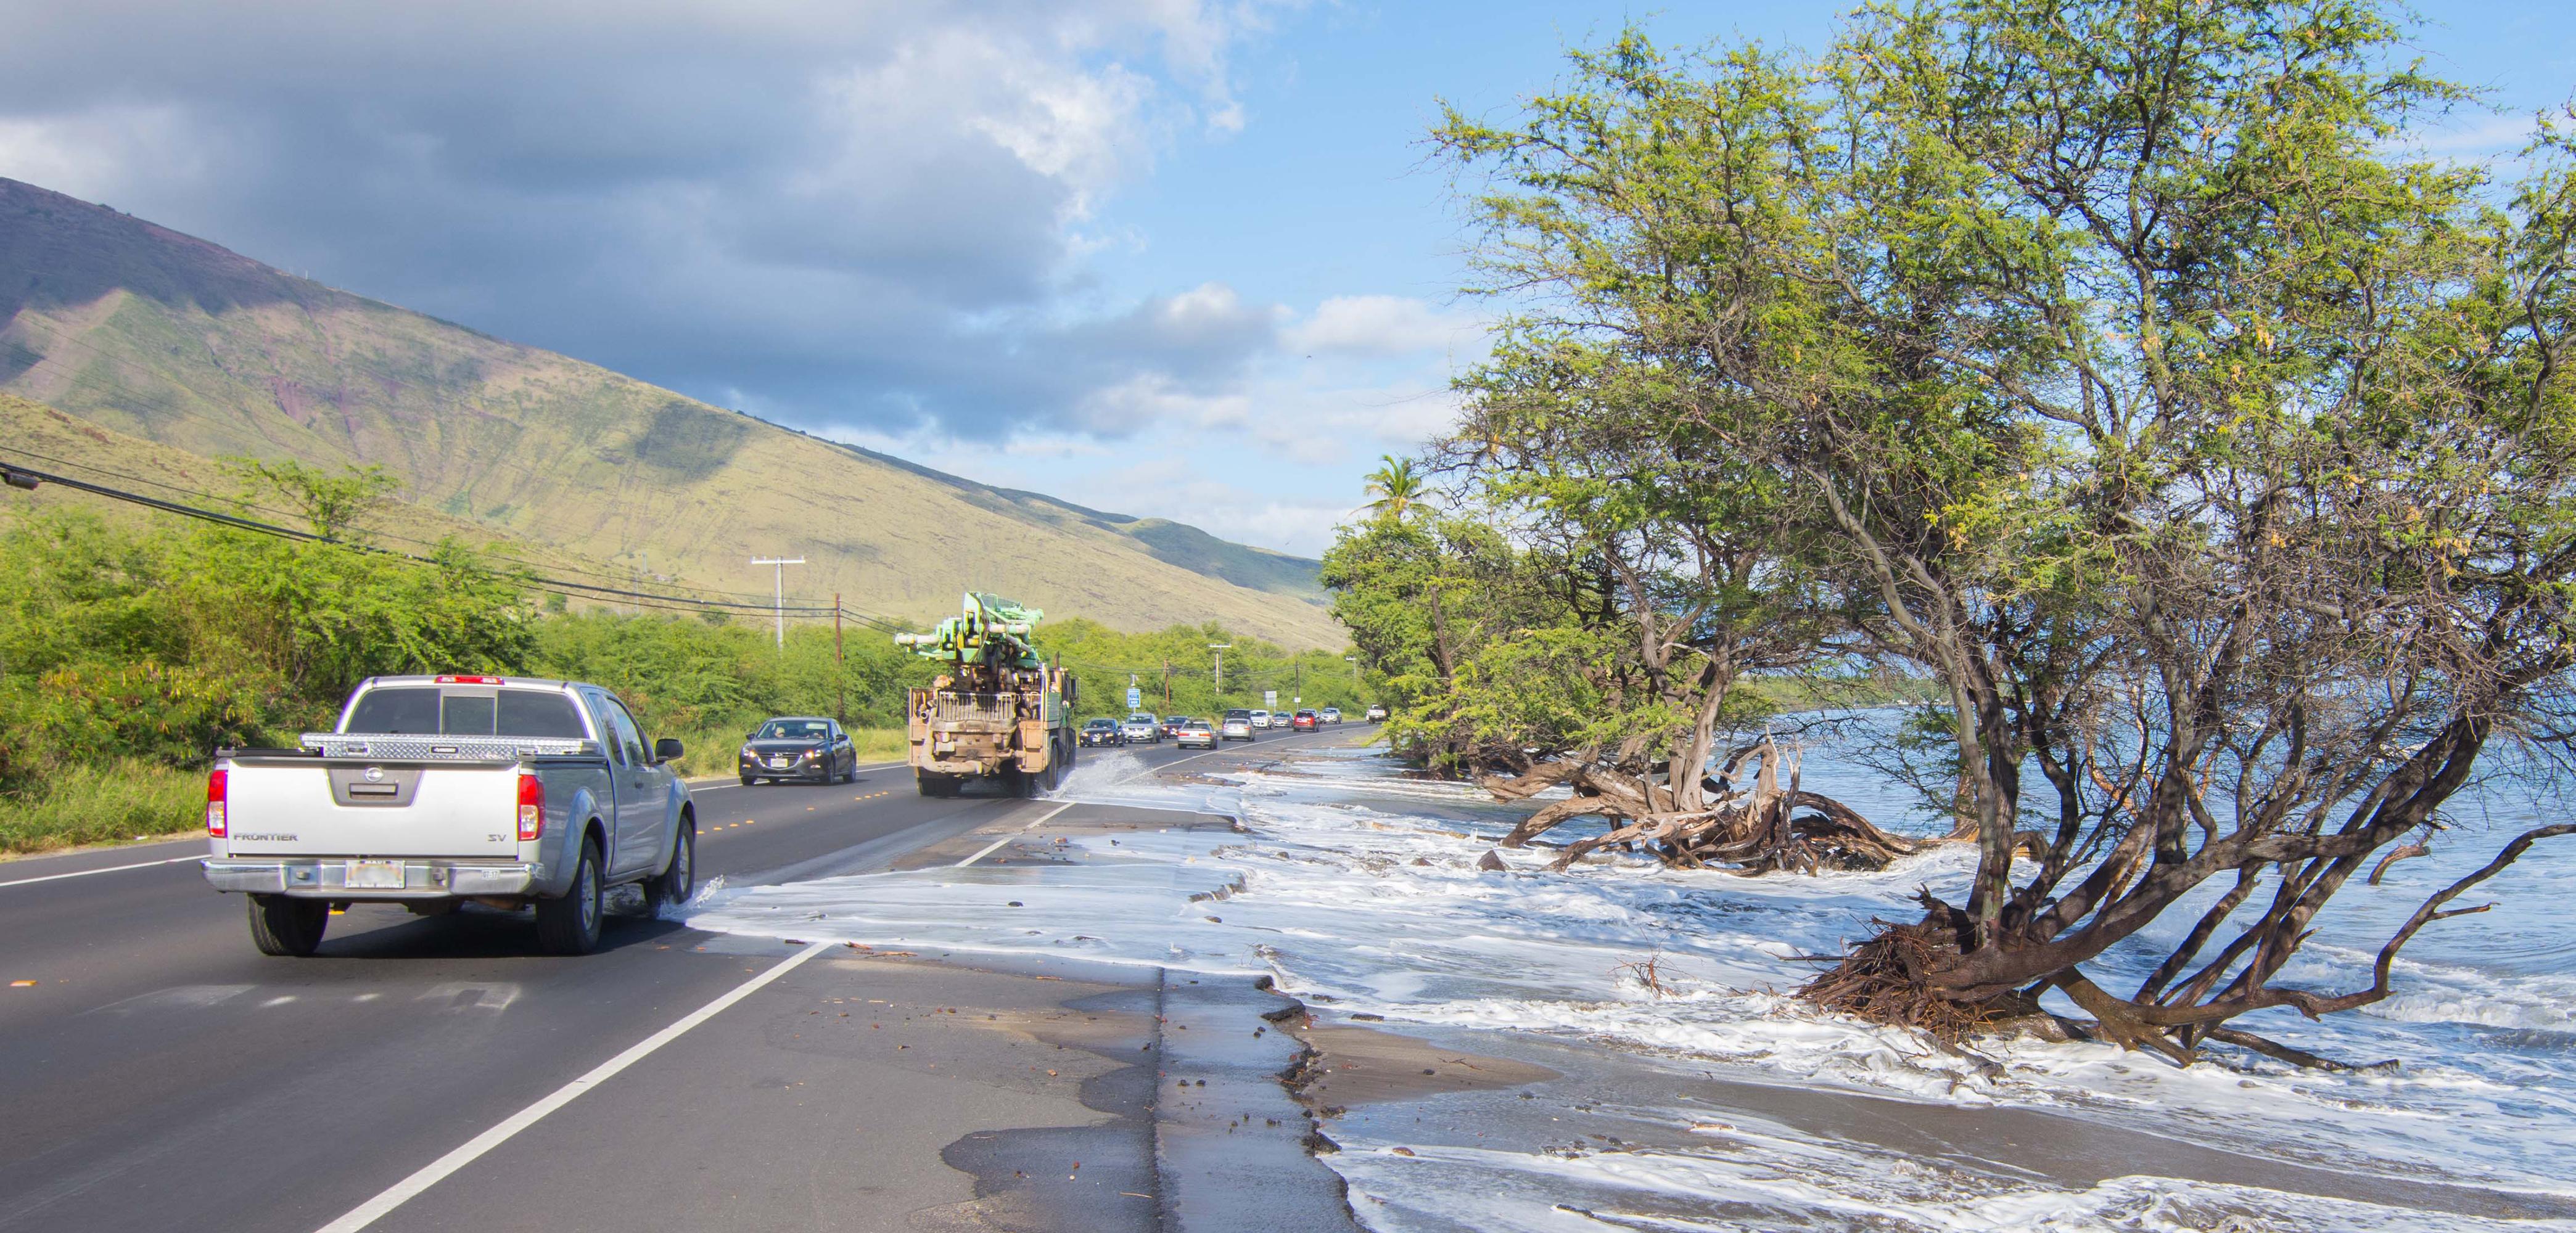 Water washing over raod at Olowalu_MileMarker14_05.26.2017_creditAsaEllison